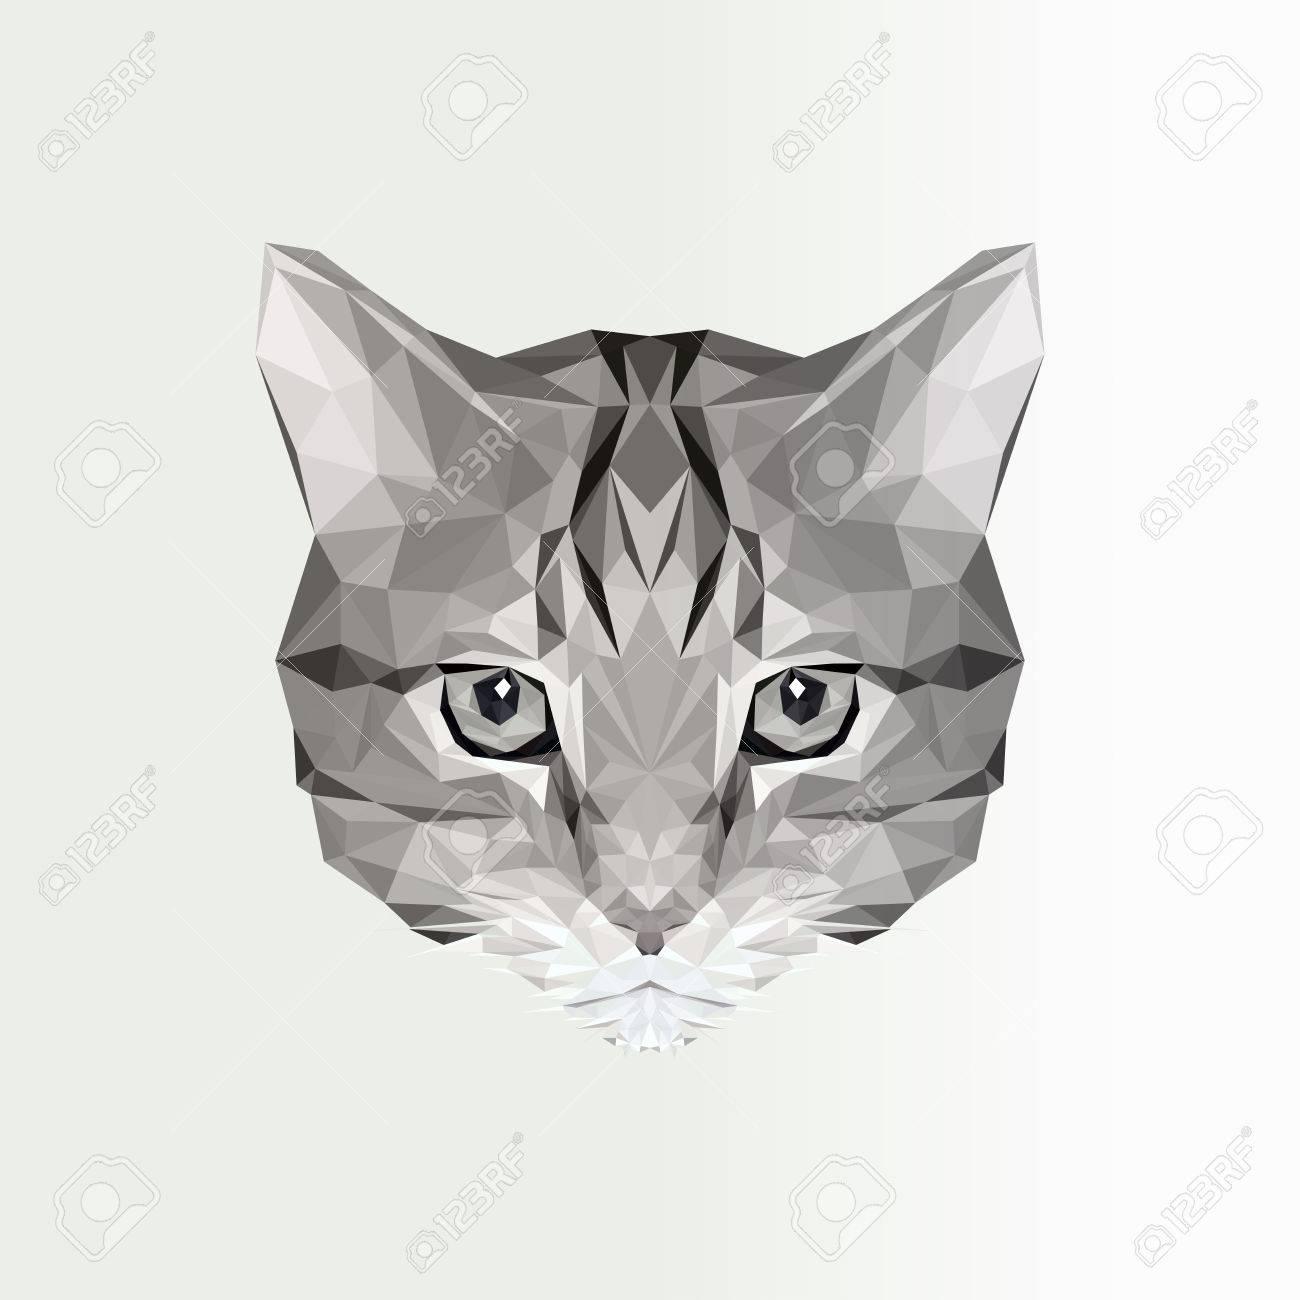 Ilustración Vectorial De Bajo Icono De Gato Poly. Silueta Poligonal ...